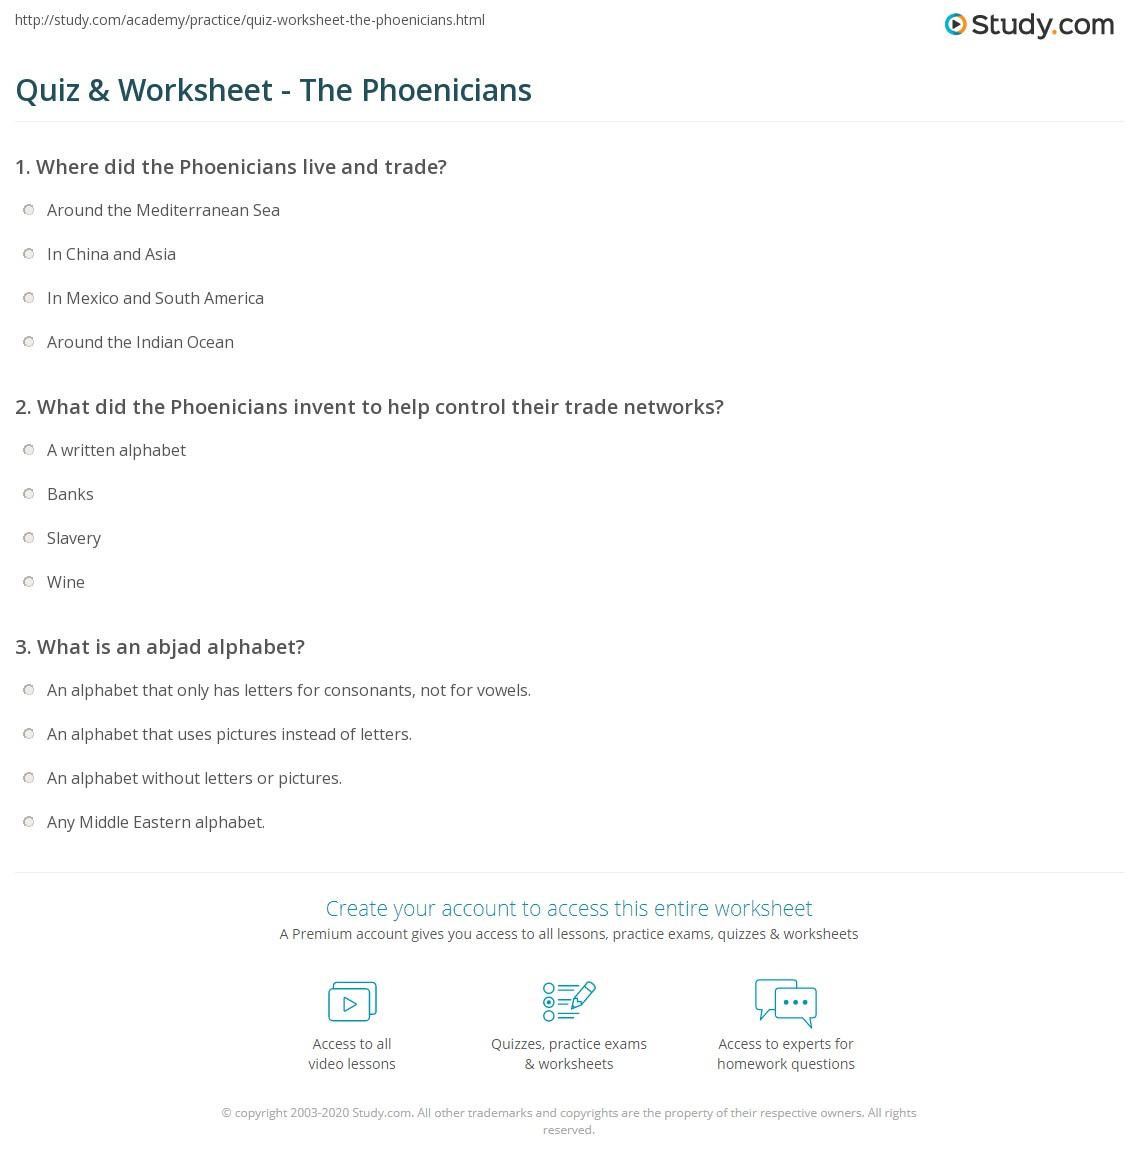 Workbooks social studies worksheets 6th grade : Quiz & Worksheet - The Phoenicians   Study.com